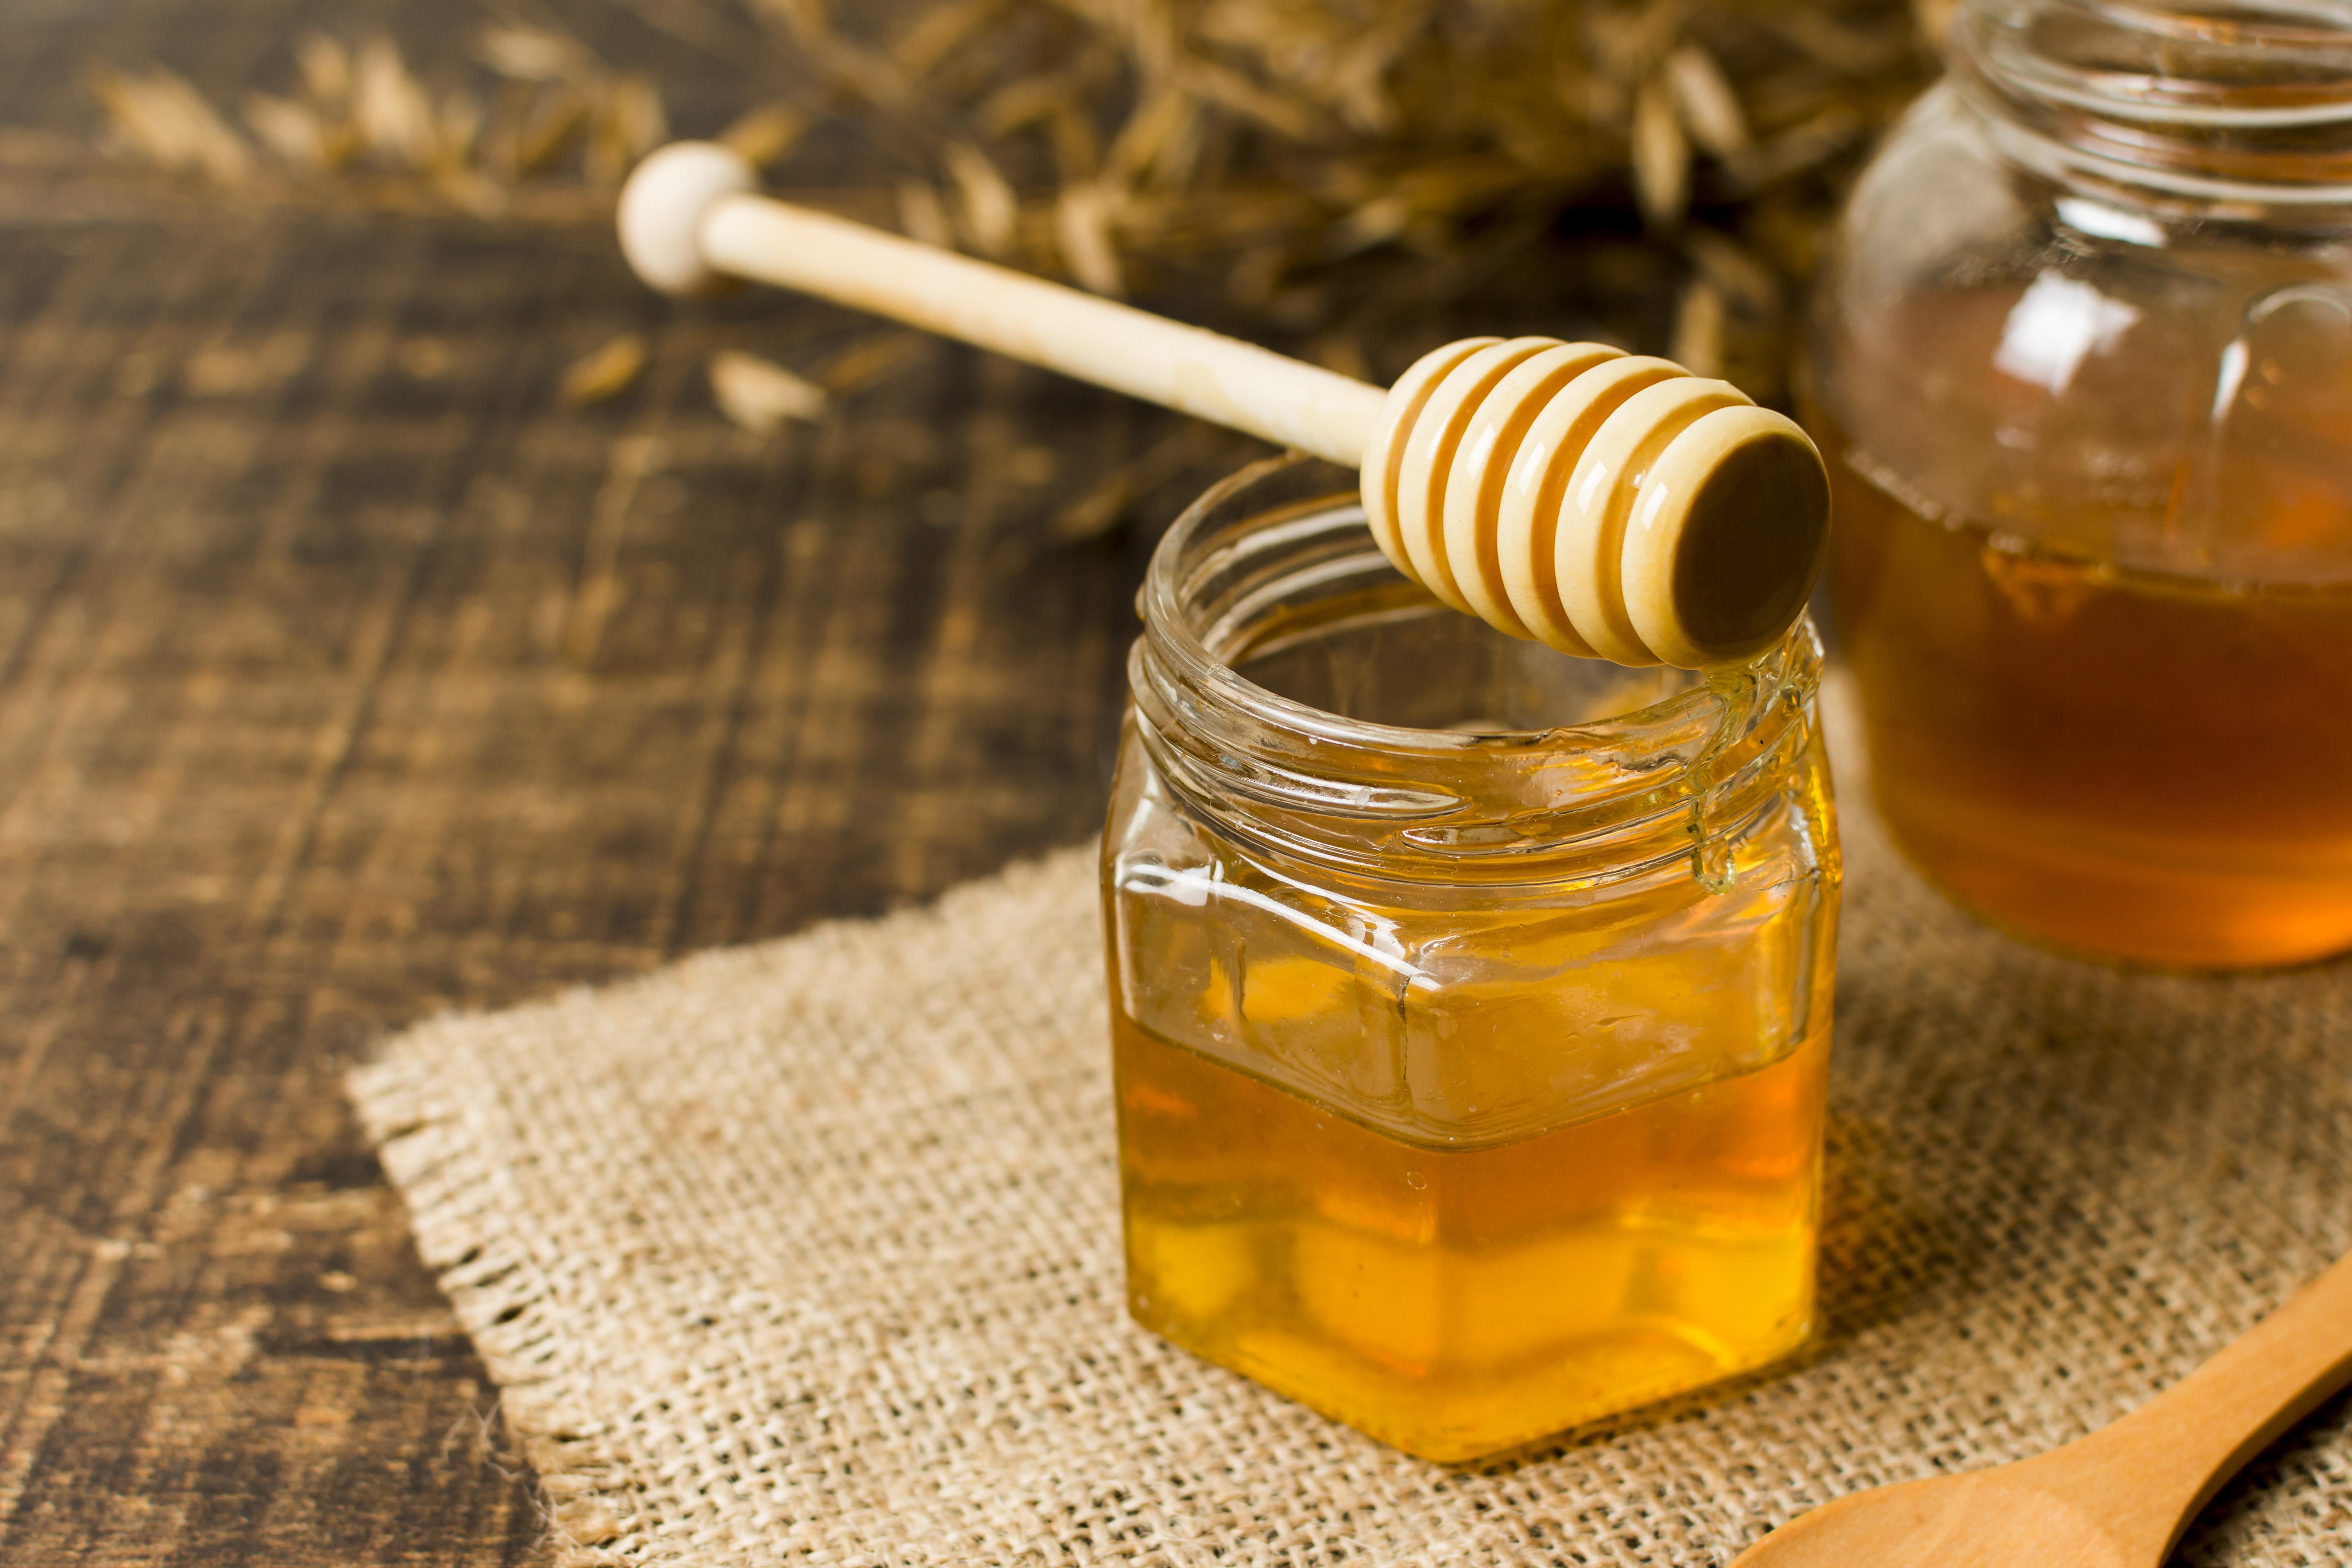 Мед можно есть вместо сахара